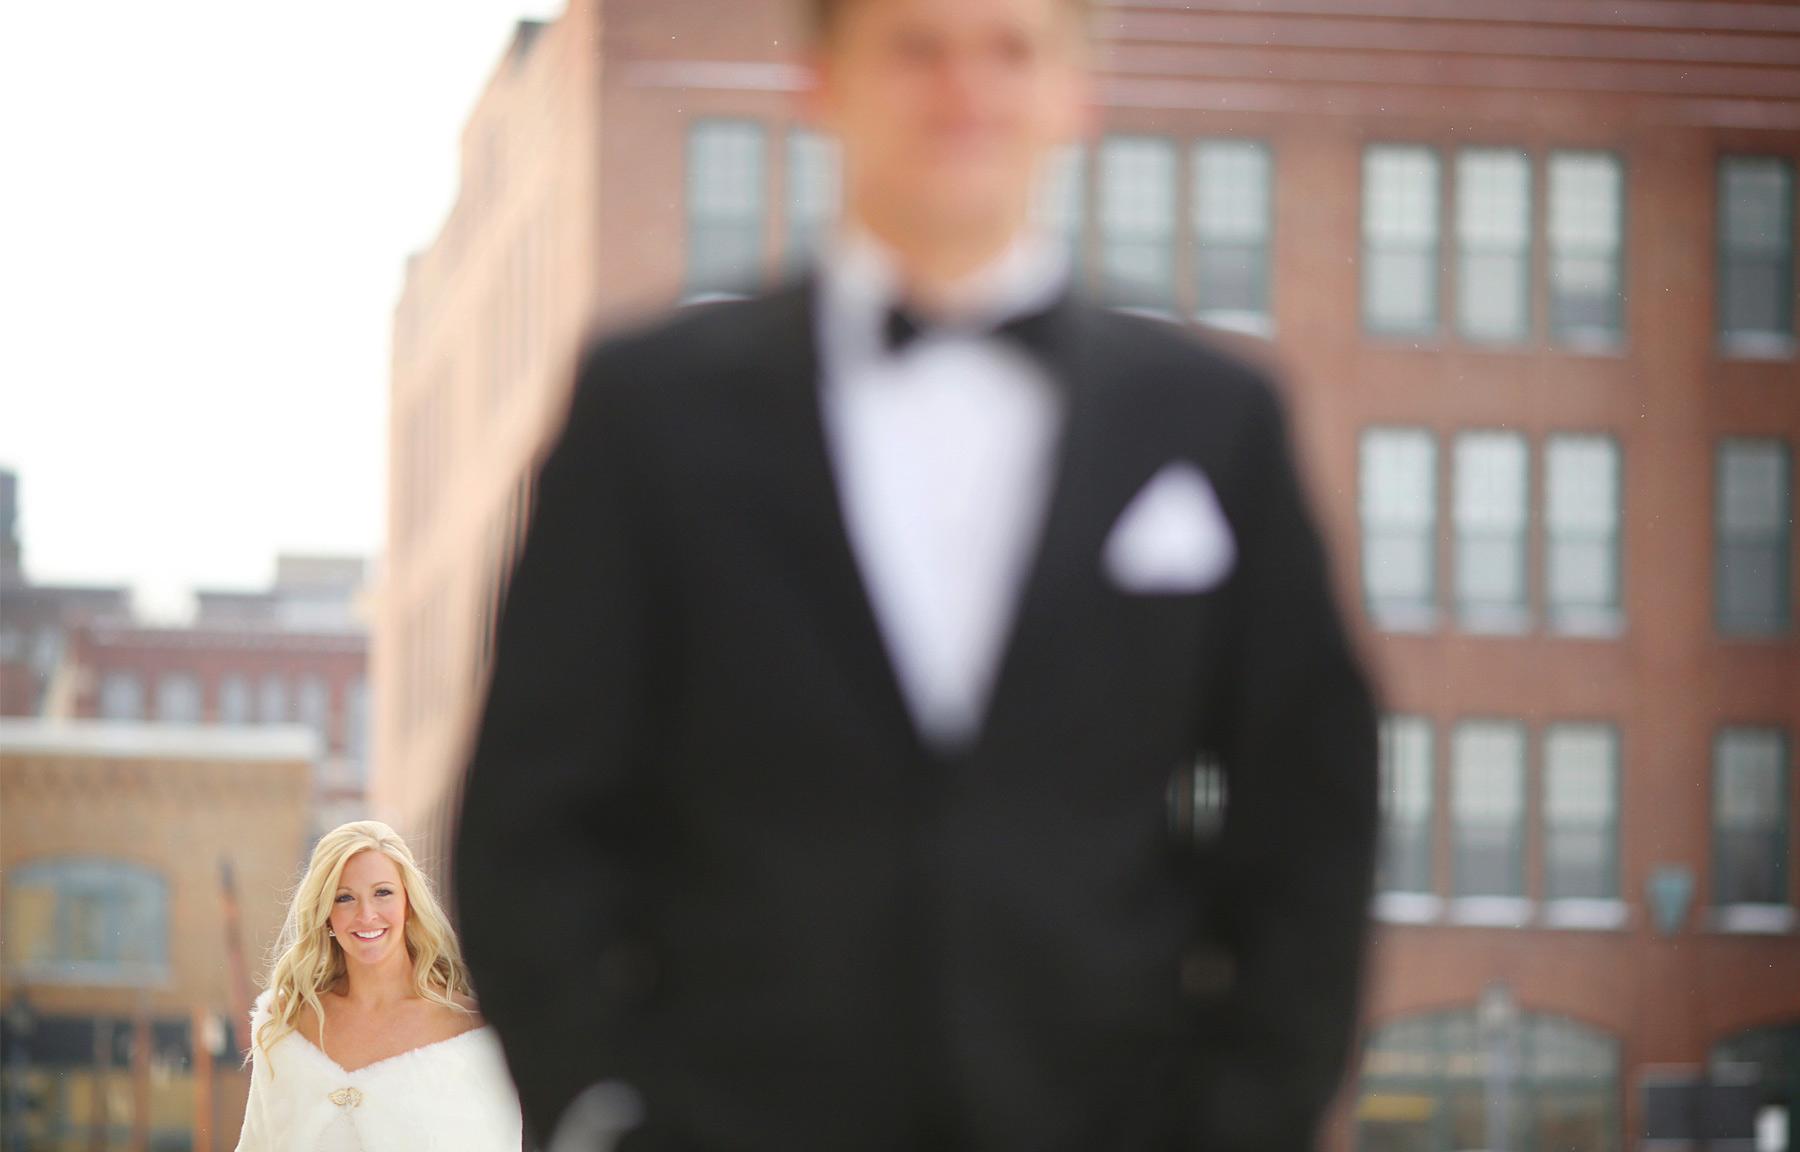 03-Minneapolis-Minnesota-Wedding-Photography-by-Vick-Photography-Downtown-First-Look-Skyline-Caroline-and-J.jpg